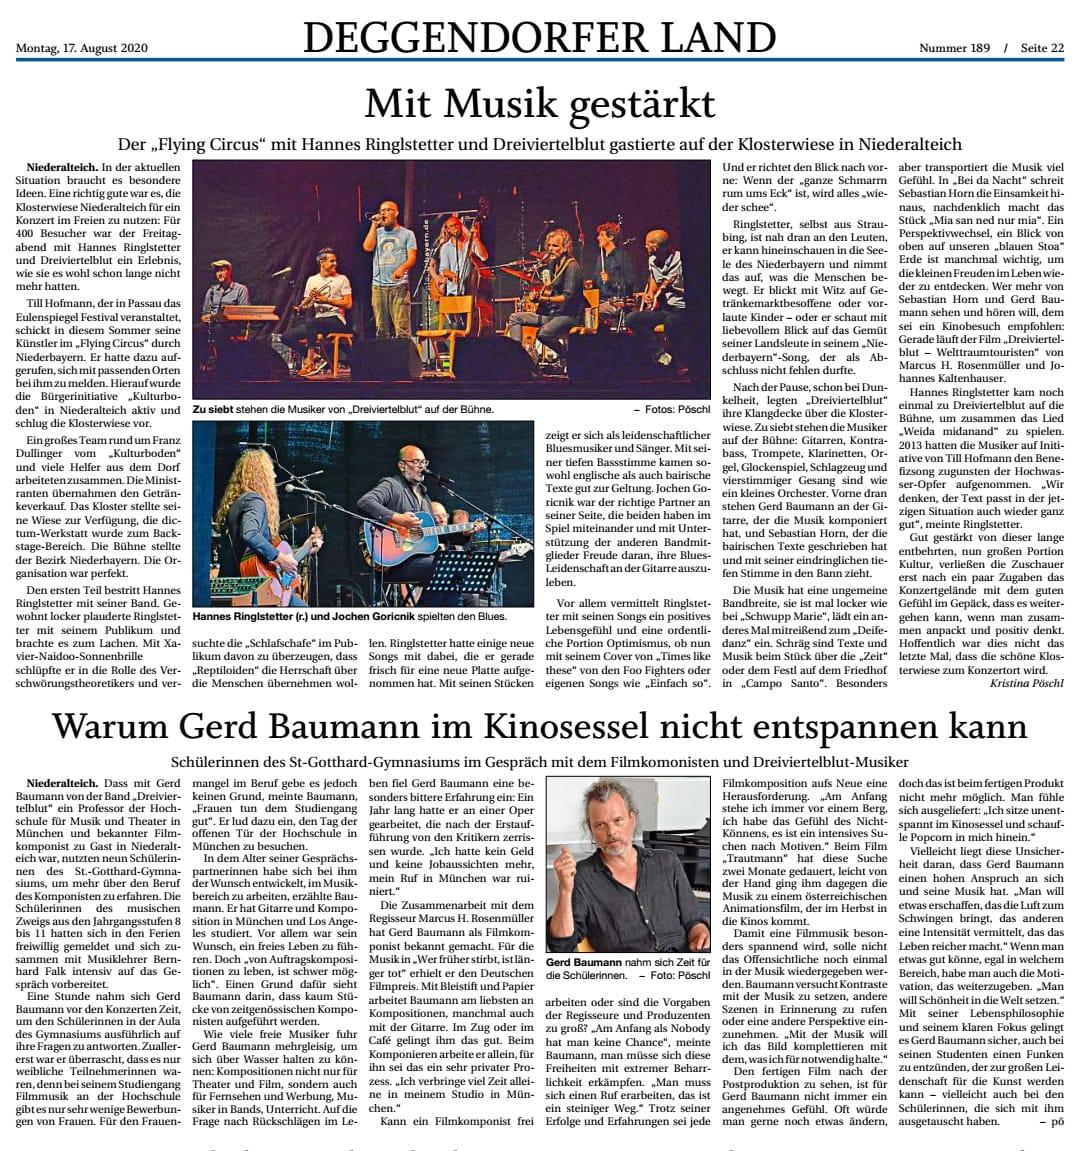 Deggendorfer Zeitung 17. August 2020